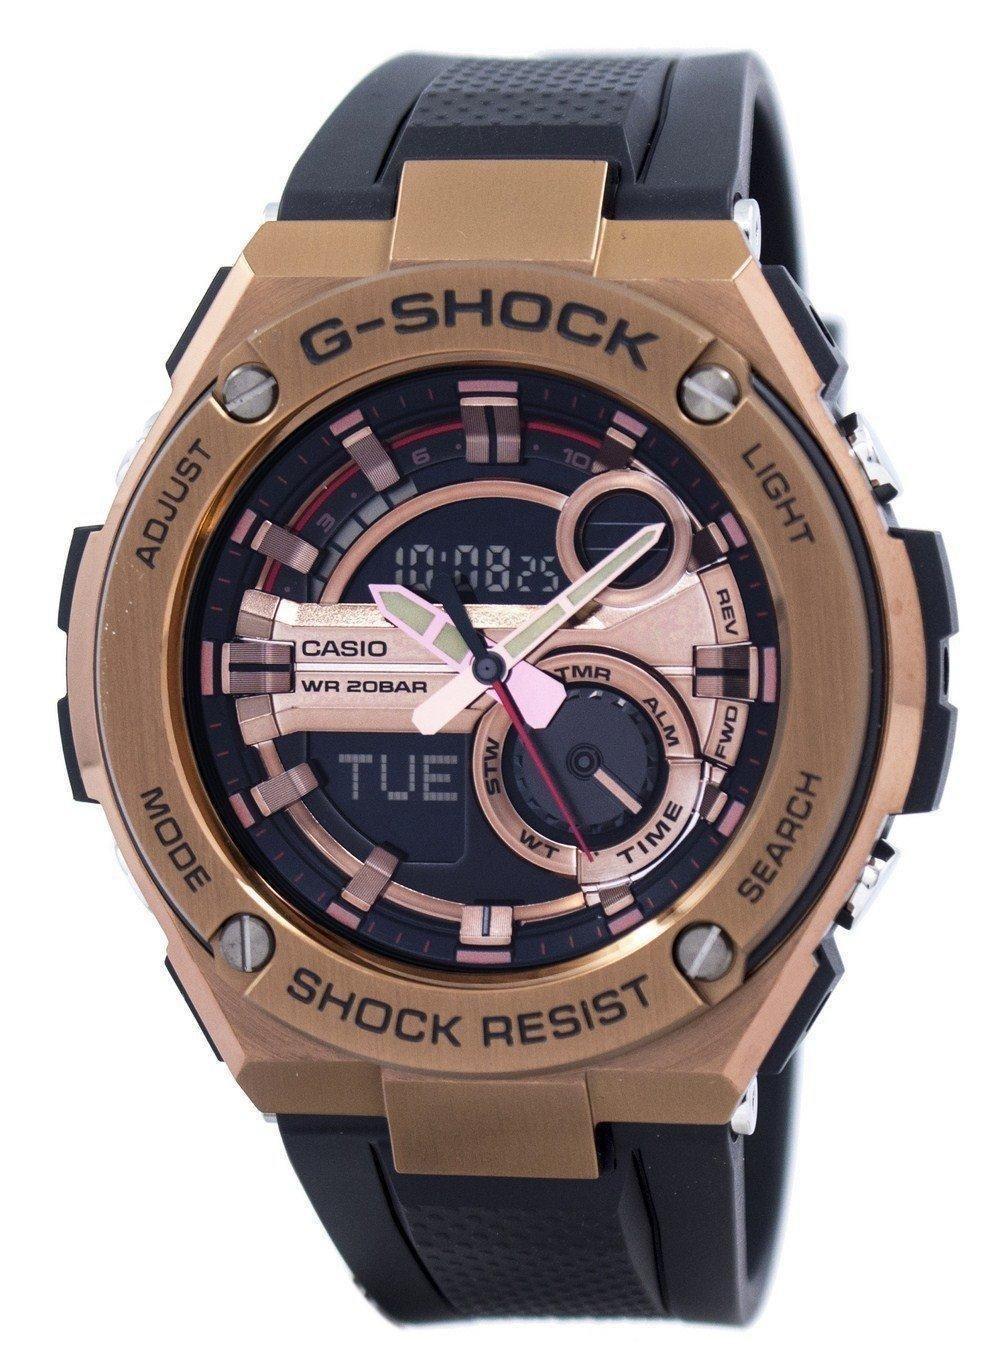 3ff14813d010 Casio G-shock G-steel Analog Digital World Time Gst-210b-4a Men s Watch  (FREE Shipping)